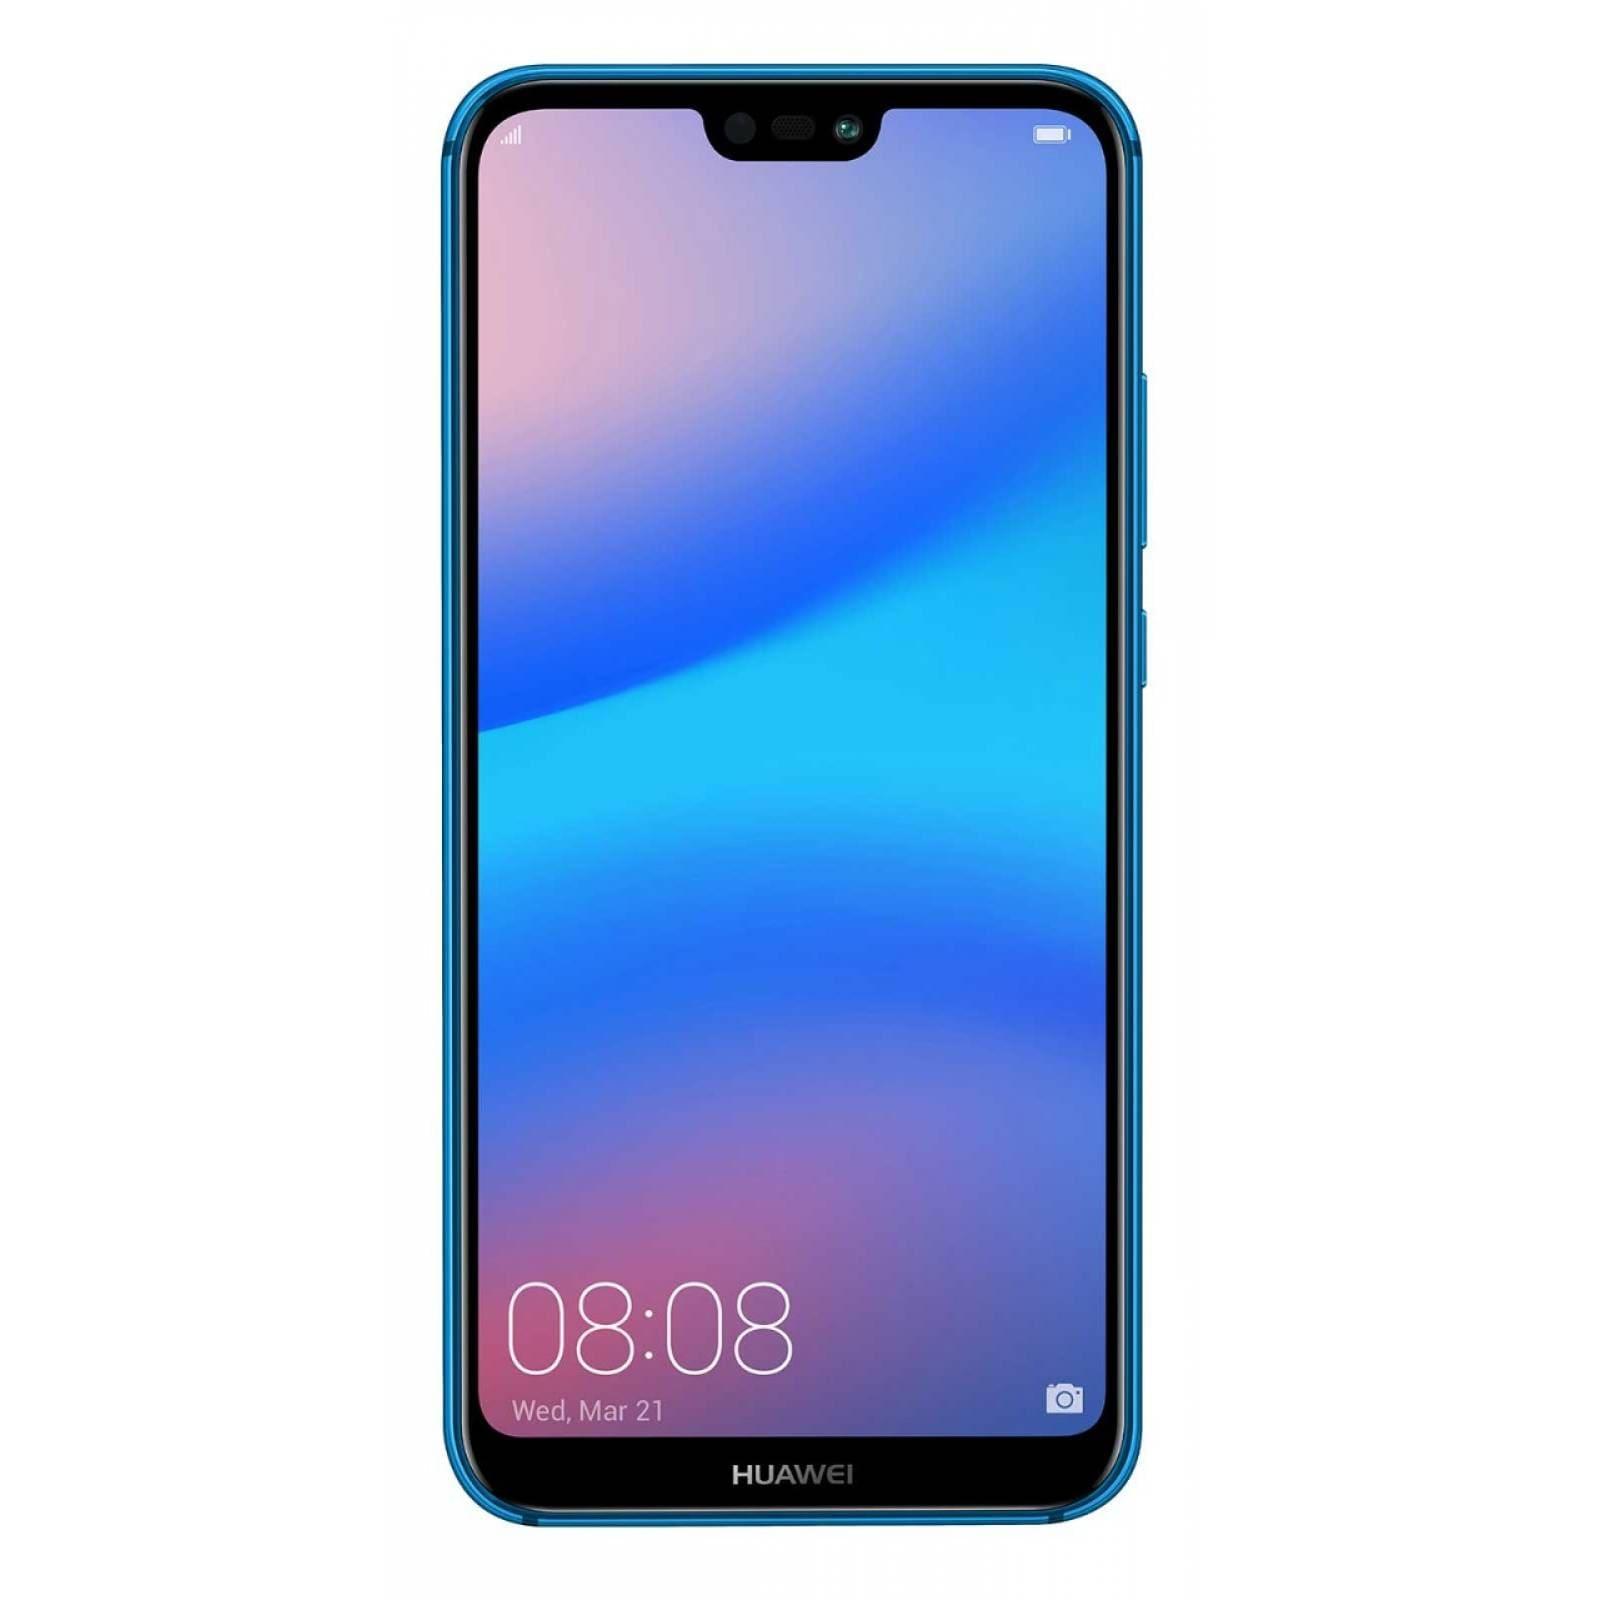 Celular HUAWEI LTE ANE-LX3 P20 LITE Color AZUL Telcel